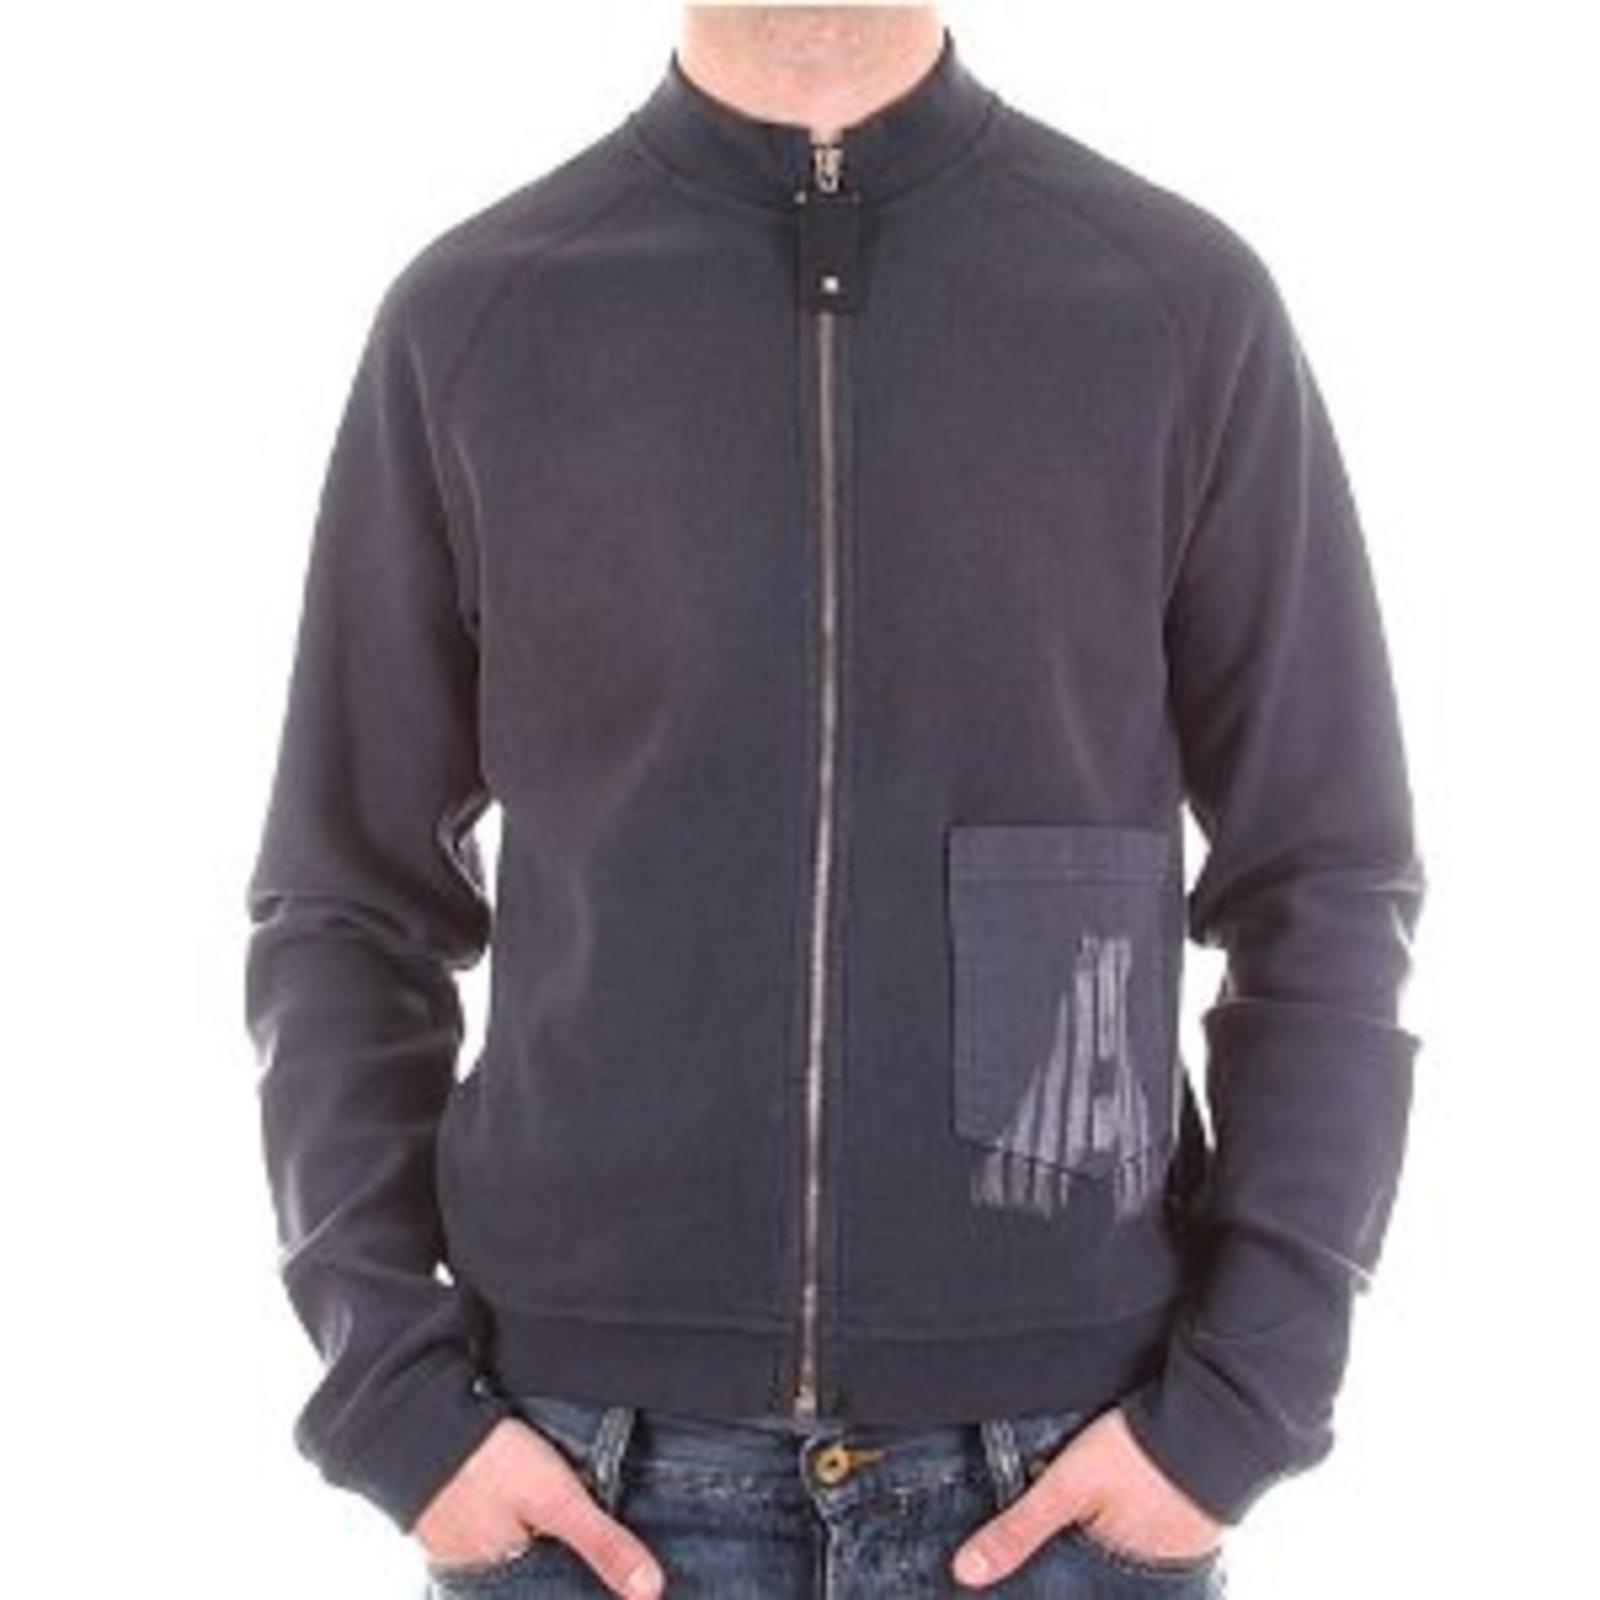 Armani Jeans jacket long sleeve zipped sweat top. AJM7929 at Togged ... d33fa1611b3d